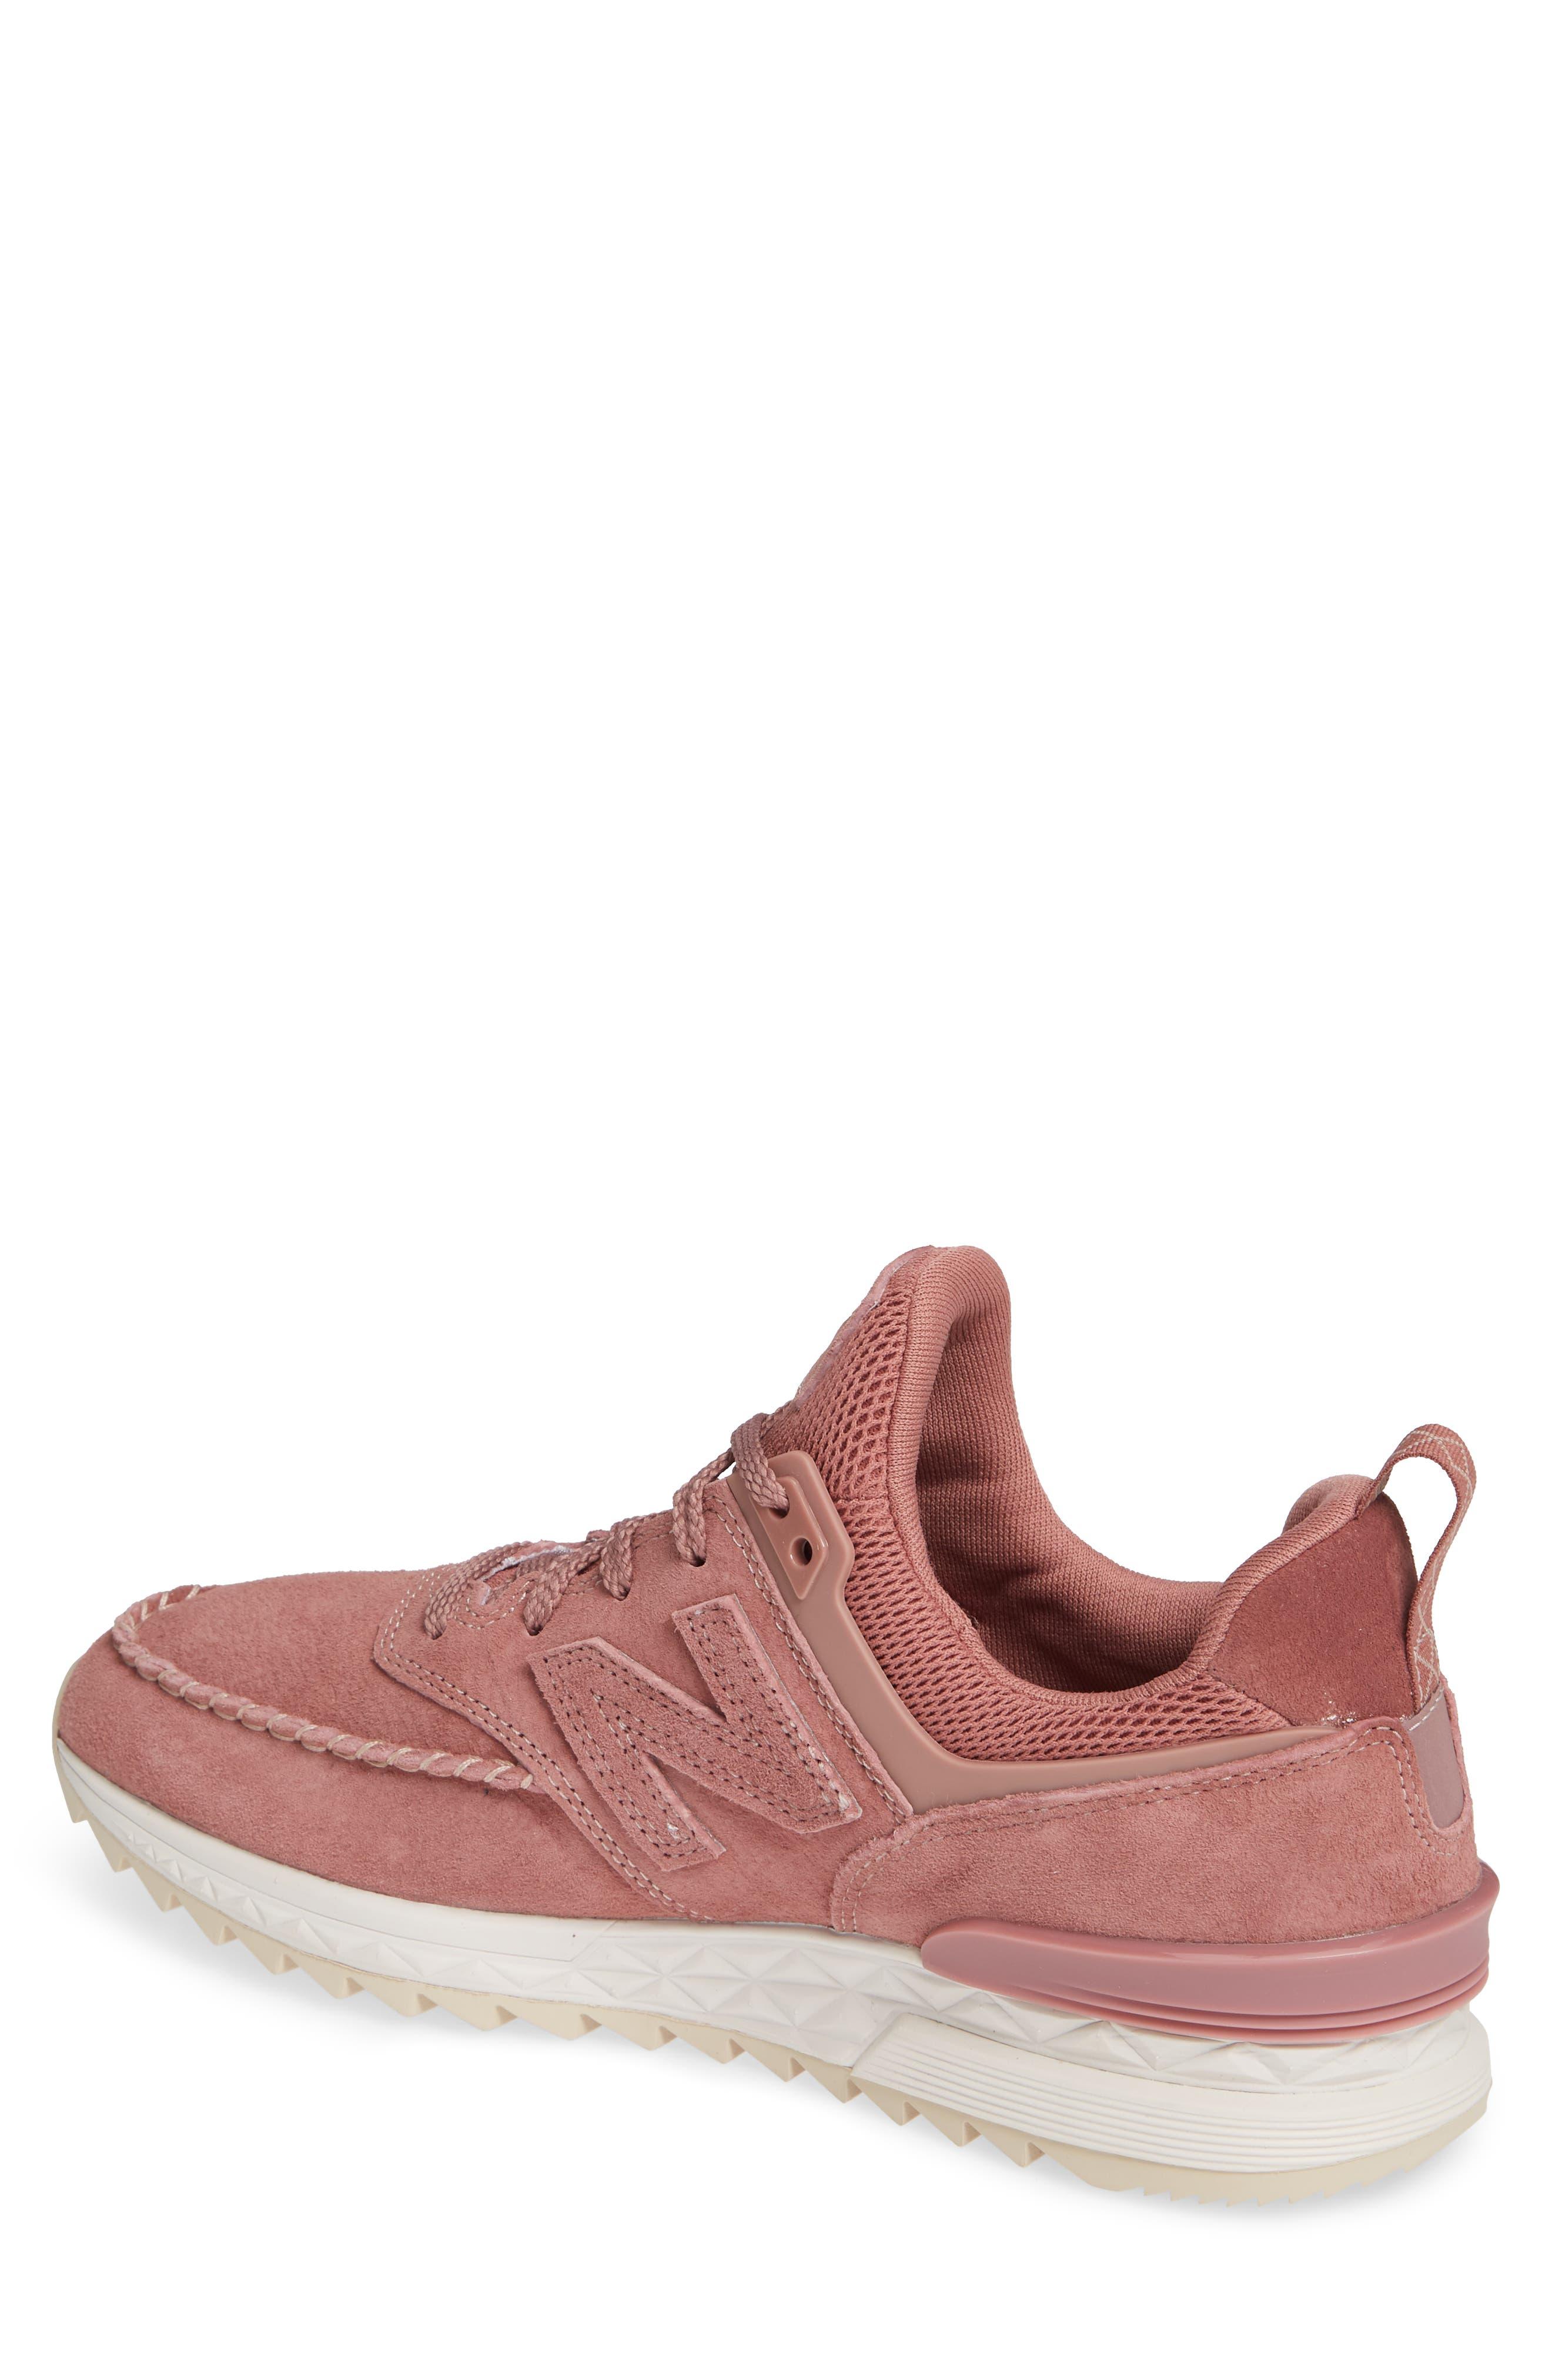 574 Sport Sneaker,                             Alternate thumbnail 2, color,                             DARK OXIDE SUEDE/ MESH